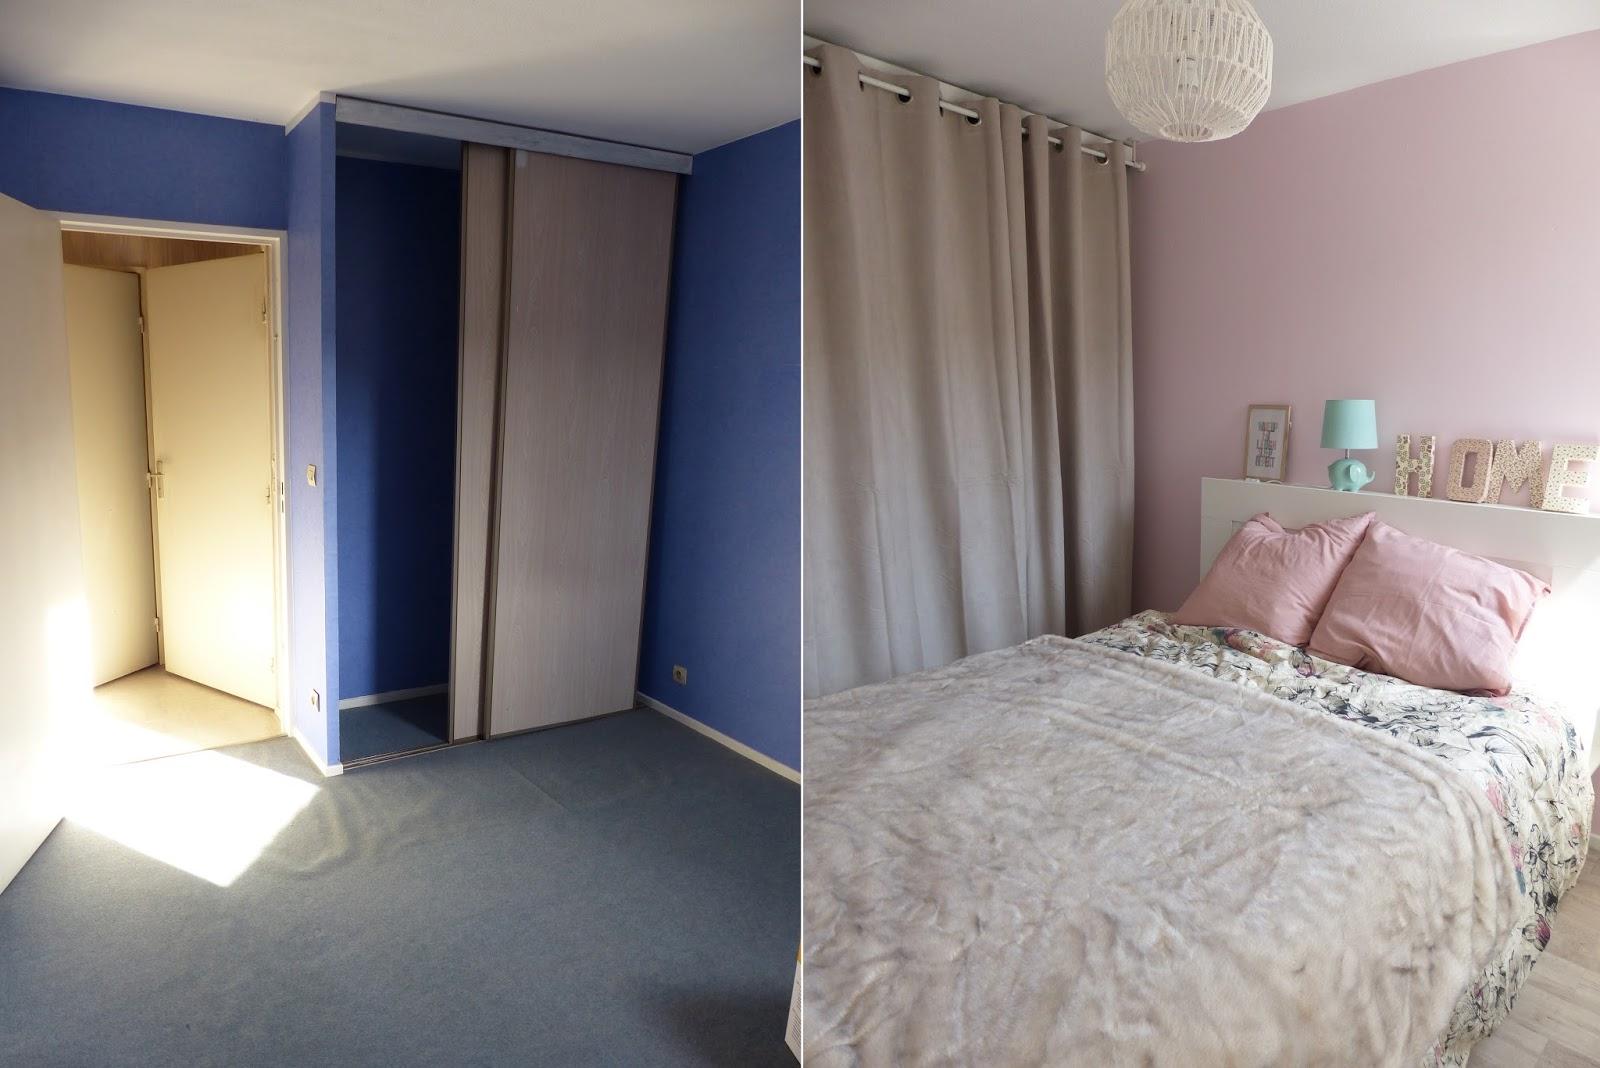 les carnets d 39 opalyne mai 2015. Black Bedroom Furniture Sets. Home Design Ideas